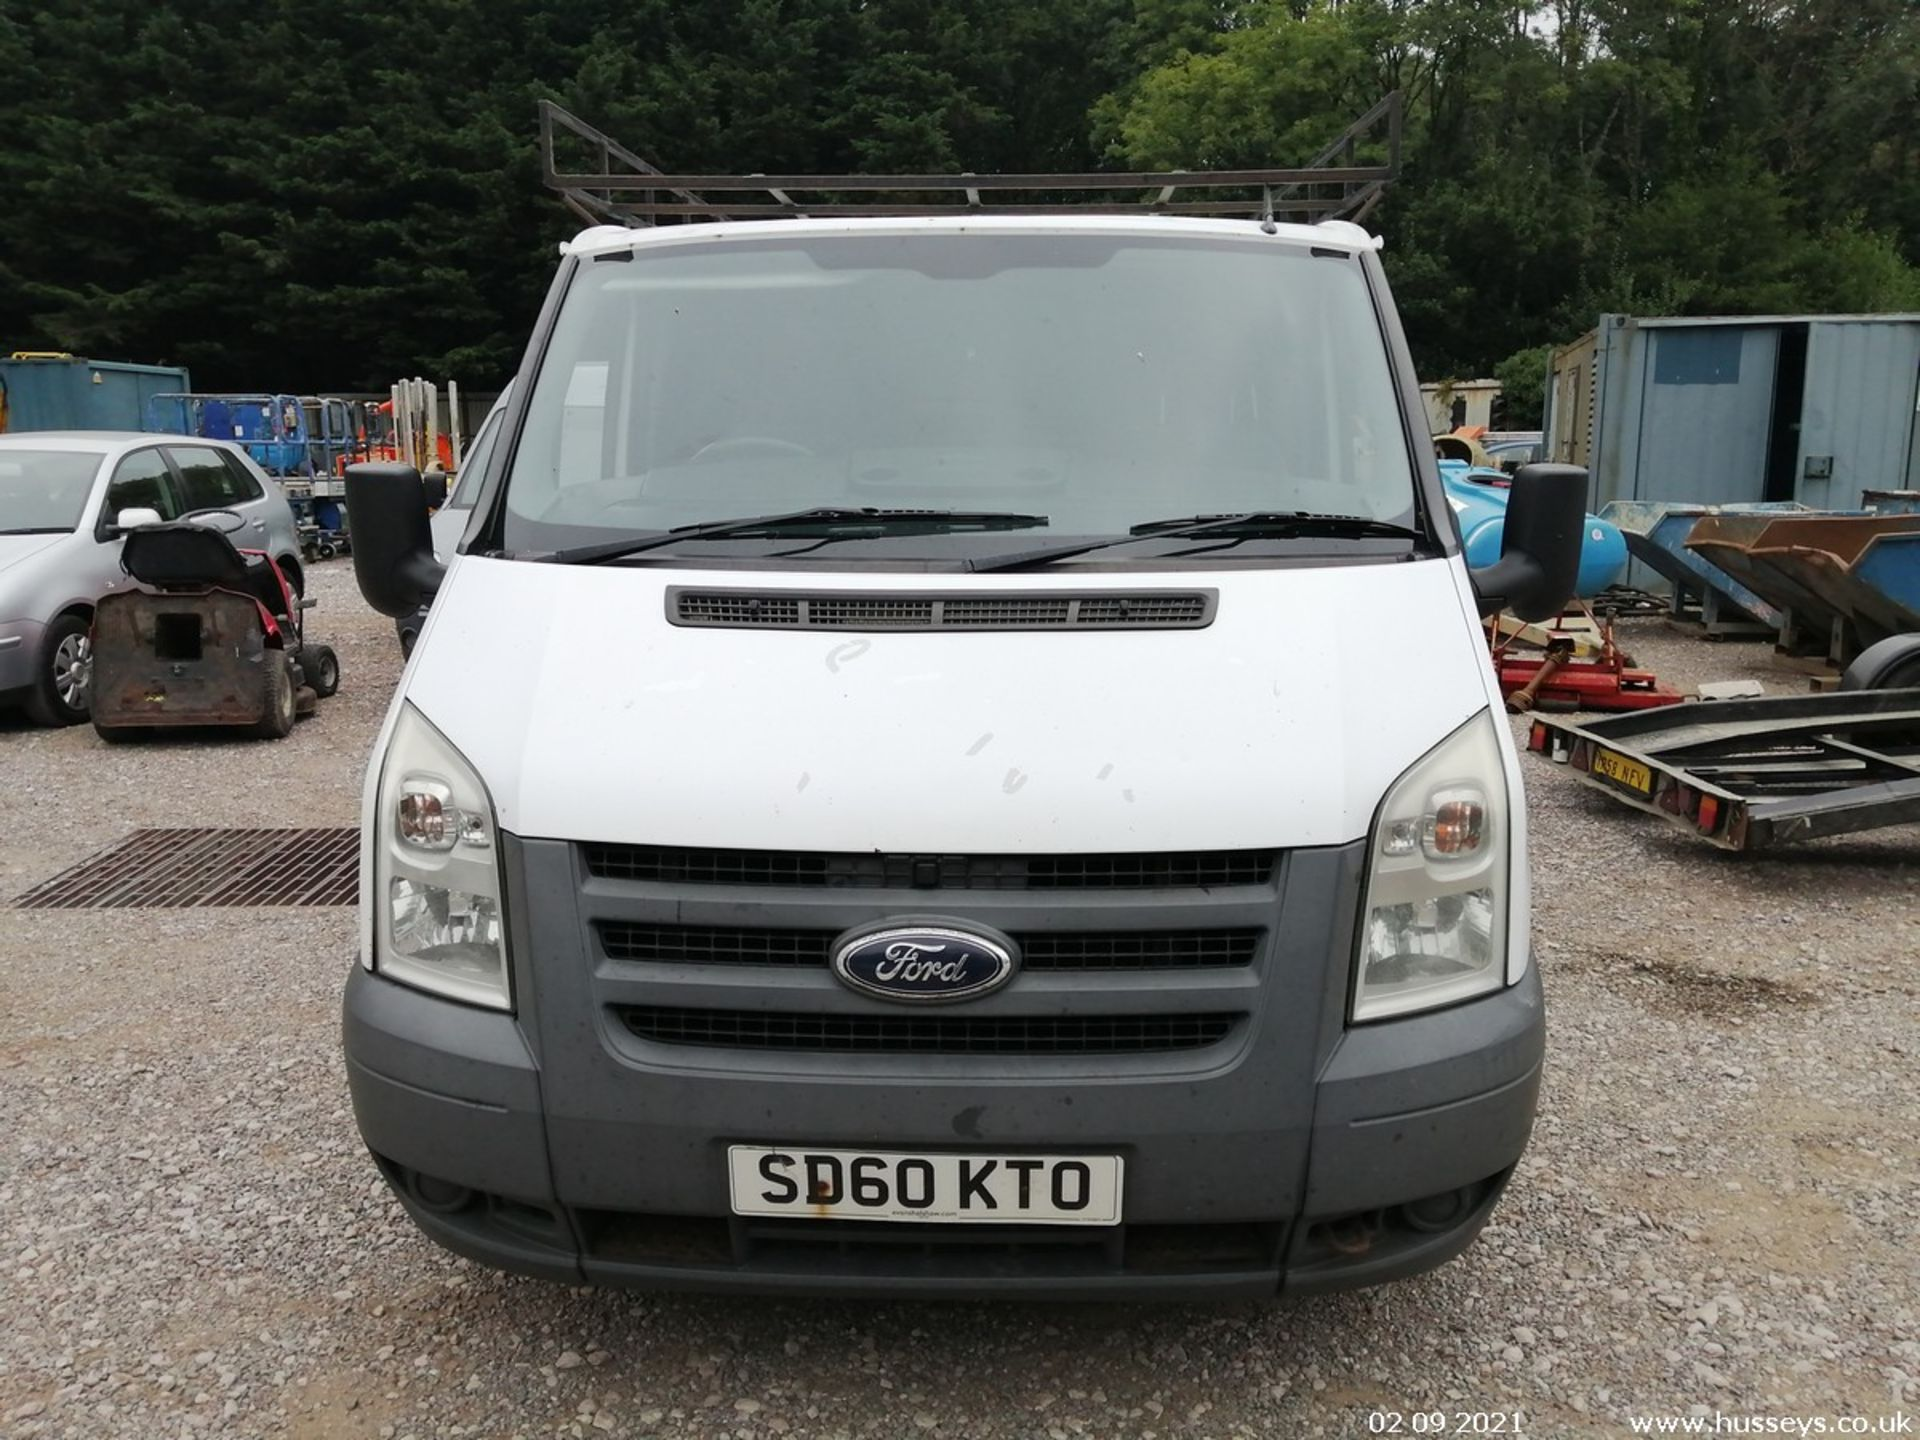 10/60 FORD TRANSIT 85 T260M FWD - 2198cc 5dr Van (White, 237k) - Image 5 of 23